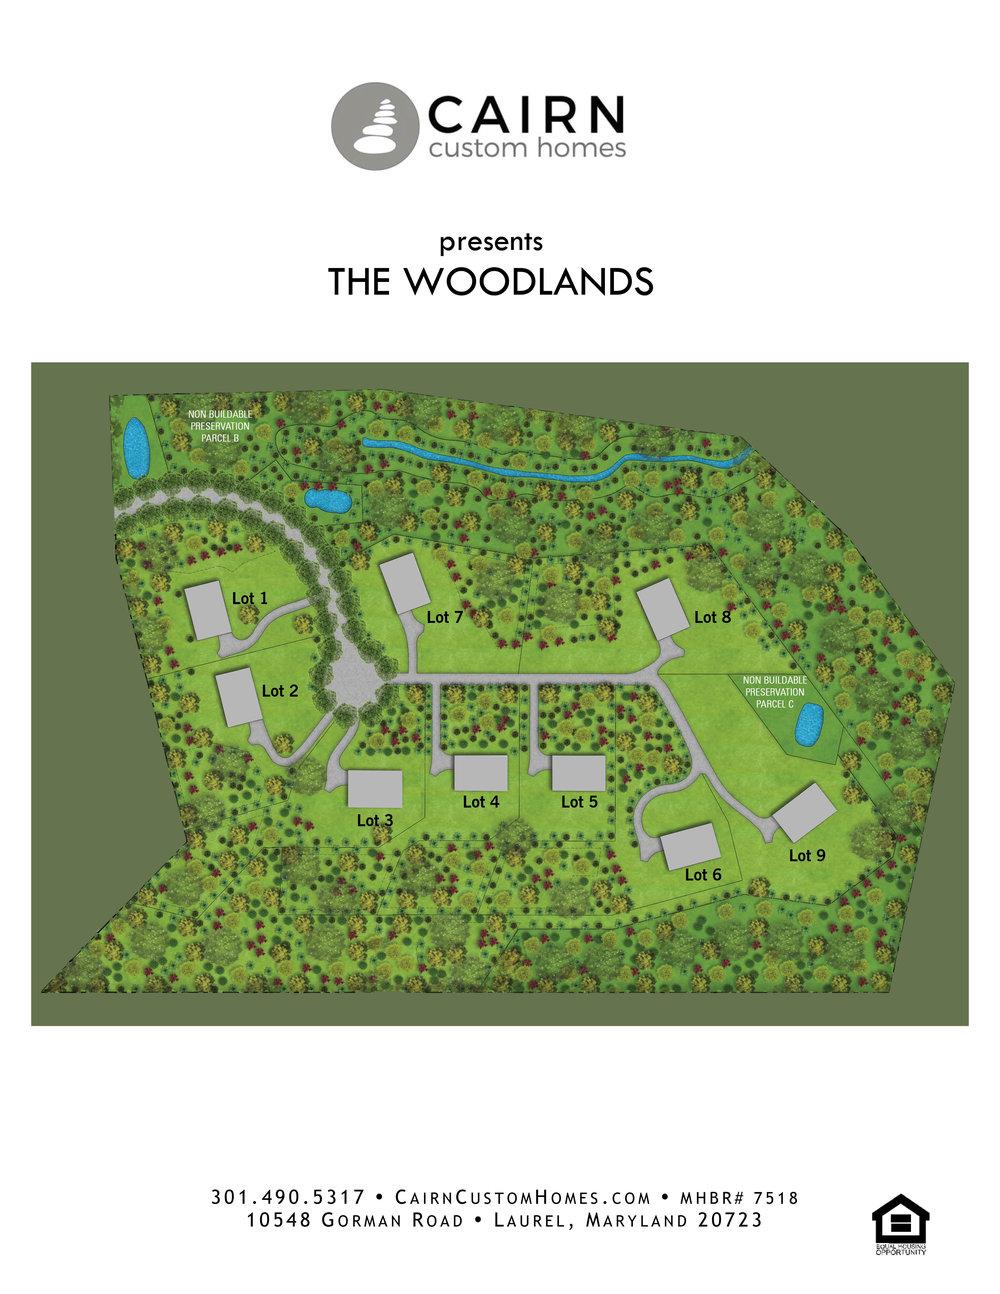 Cairn Custom Homes - The Woodlands JPEG.jpg